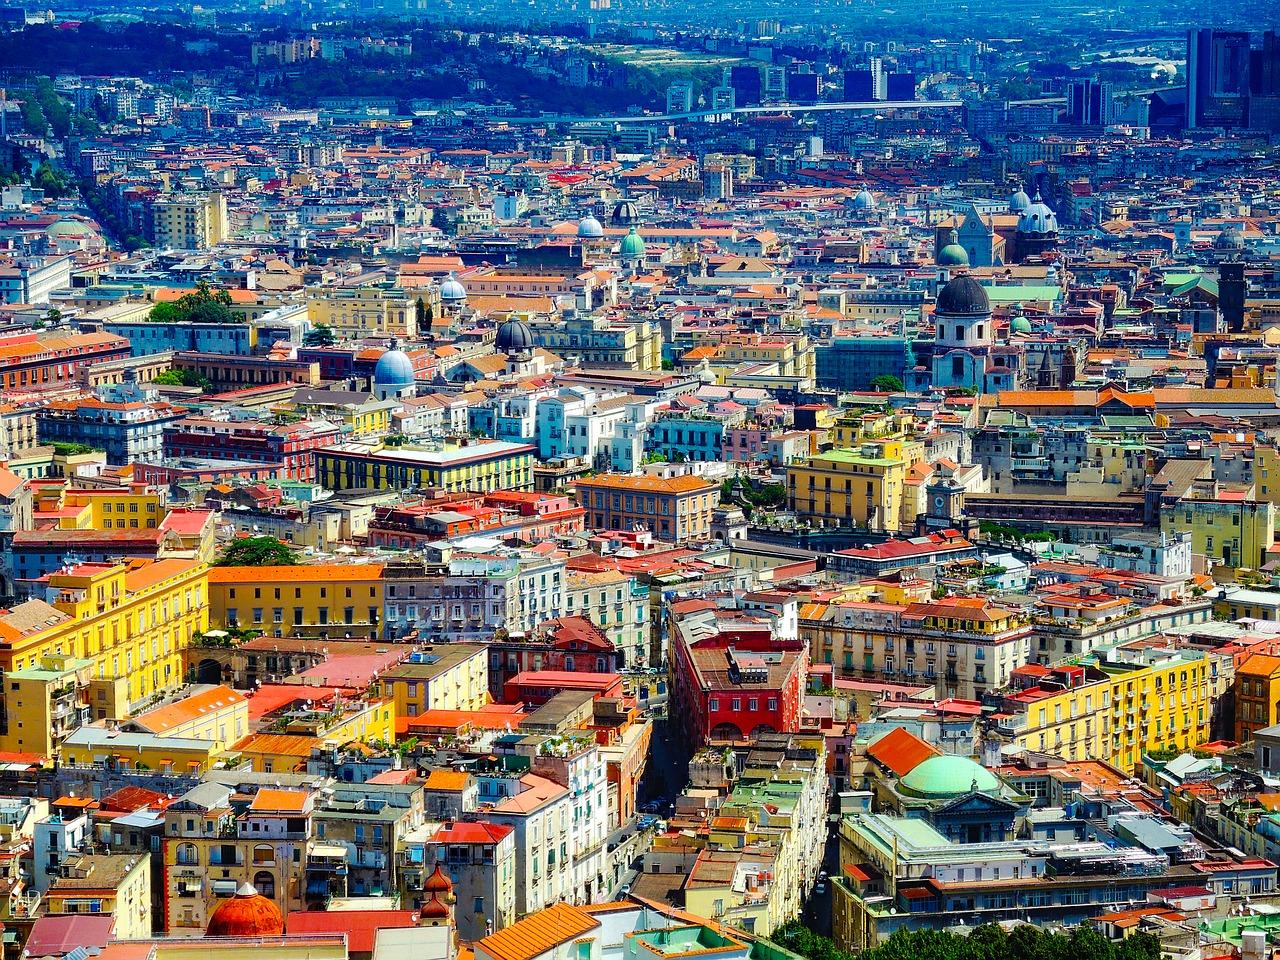 Cidade de Nápoles